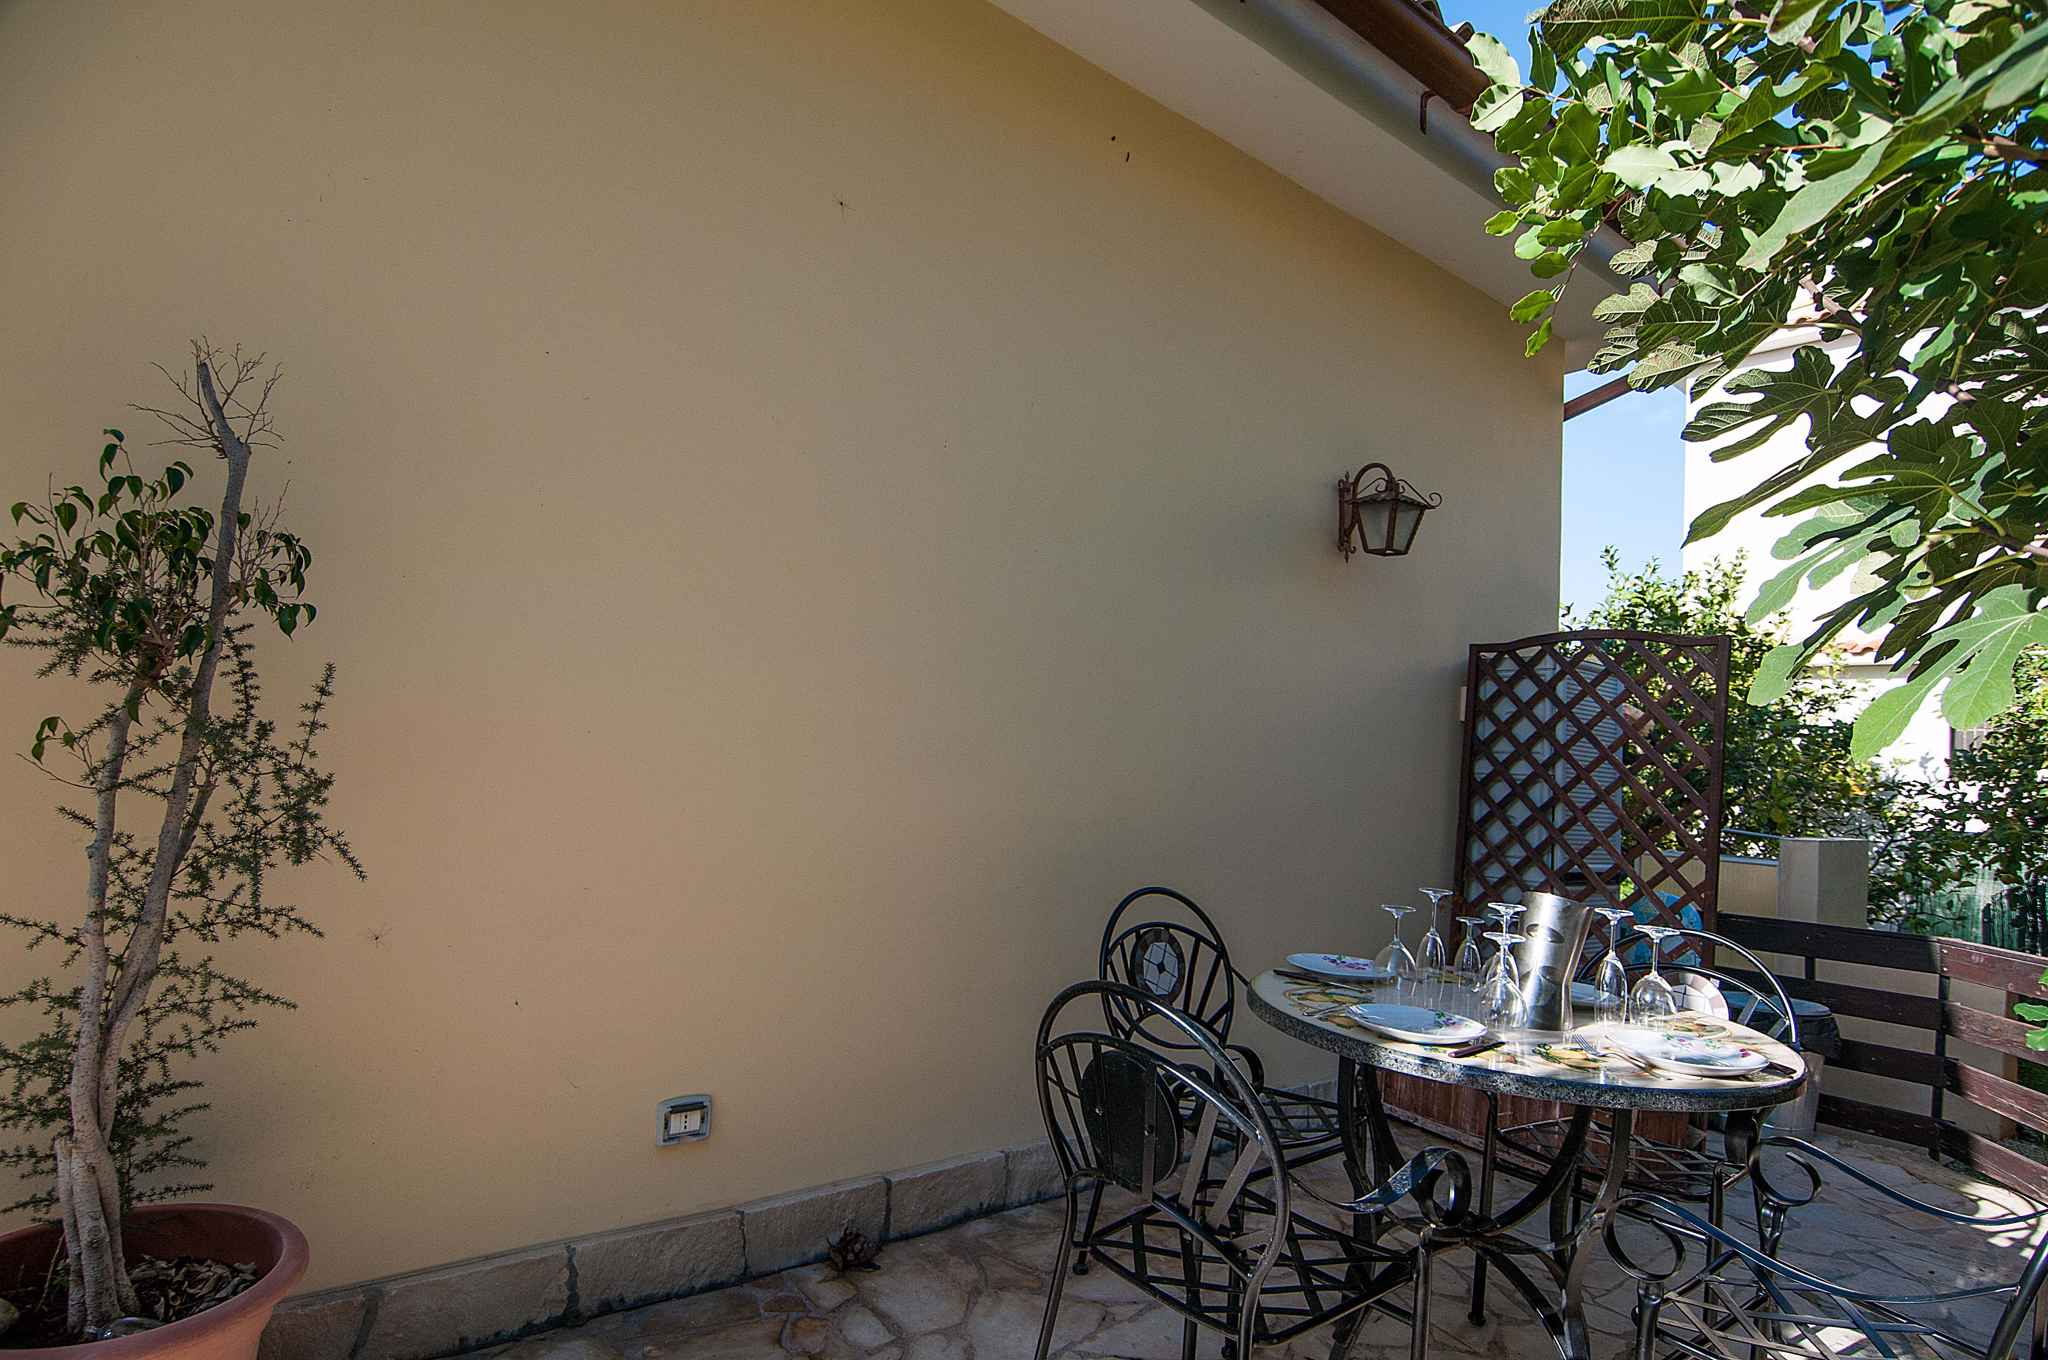 Maison de vacances mit Blick auf Zitronengarten (317534), Lido di Noto, Siracusa, Sicile, Italie, image 13